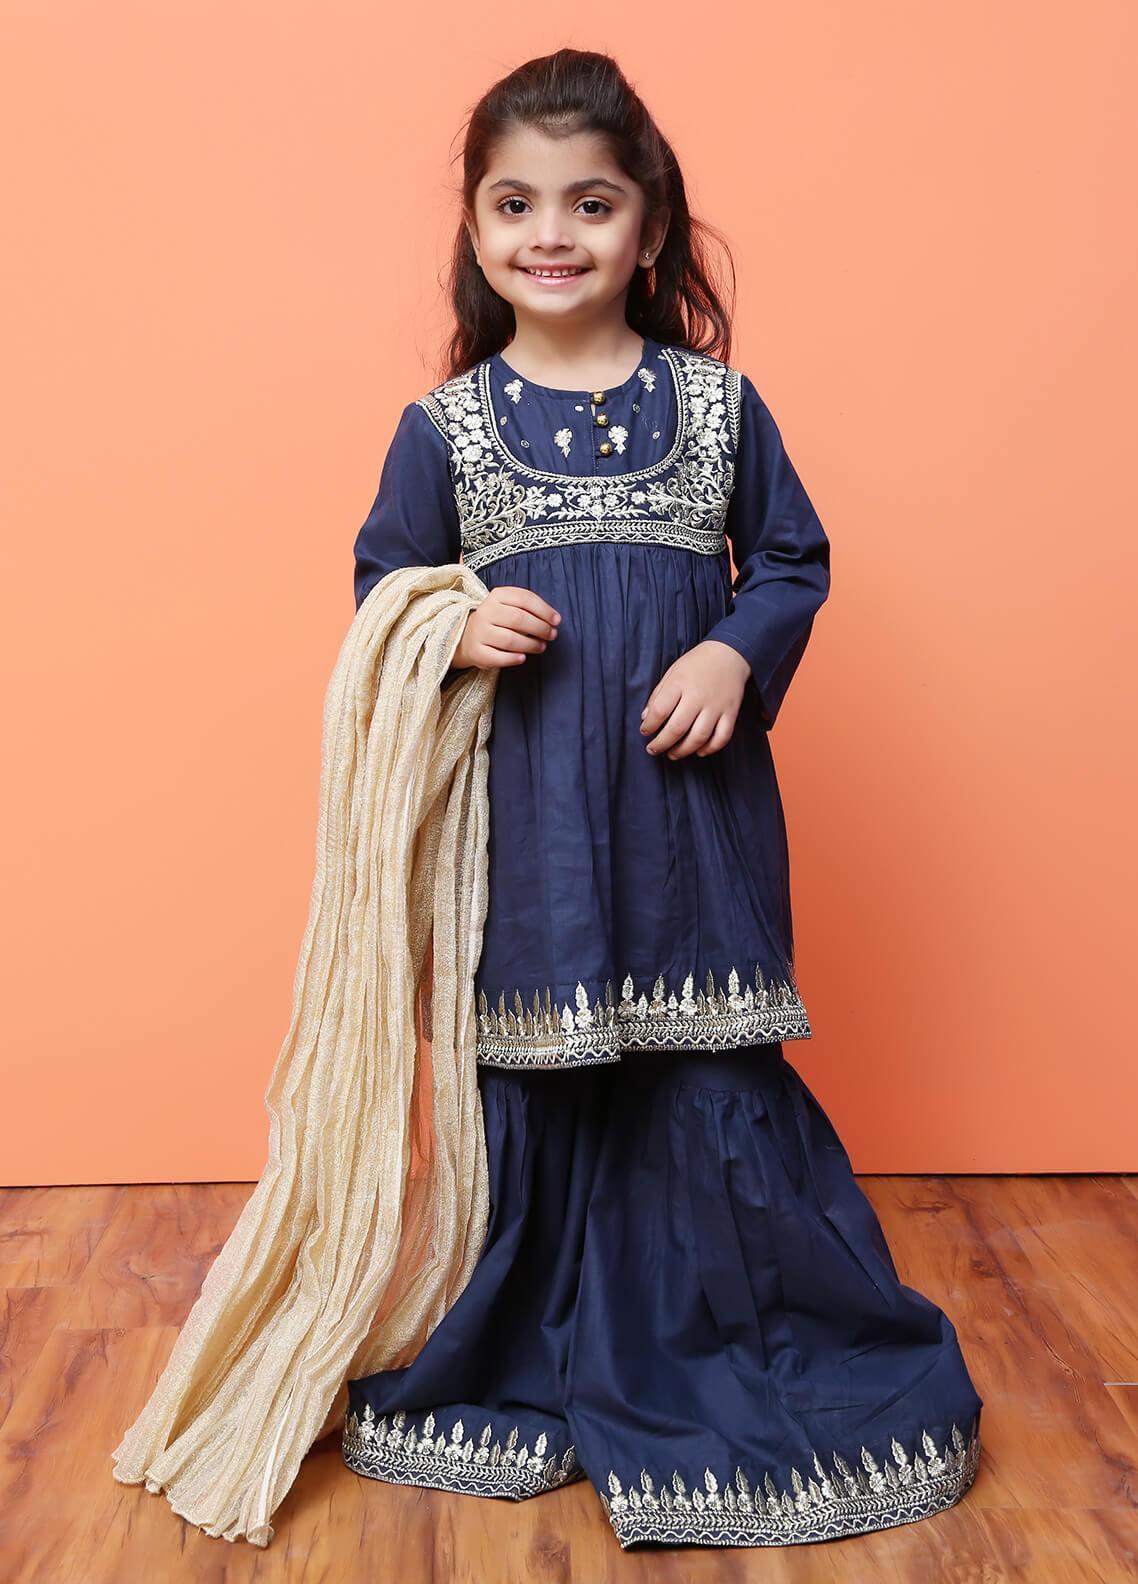 46efd6ea38 Ochre Clothing - Buy Ochre Clothing for Kids Online | Ochre Girls ...